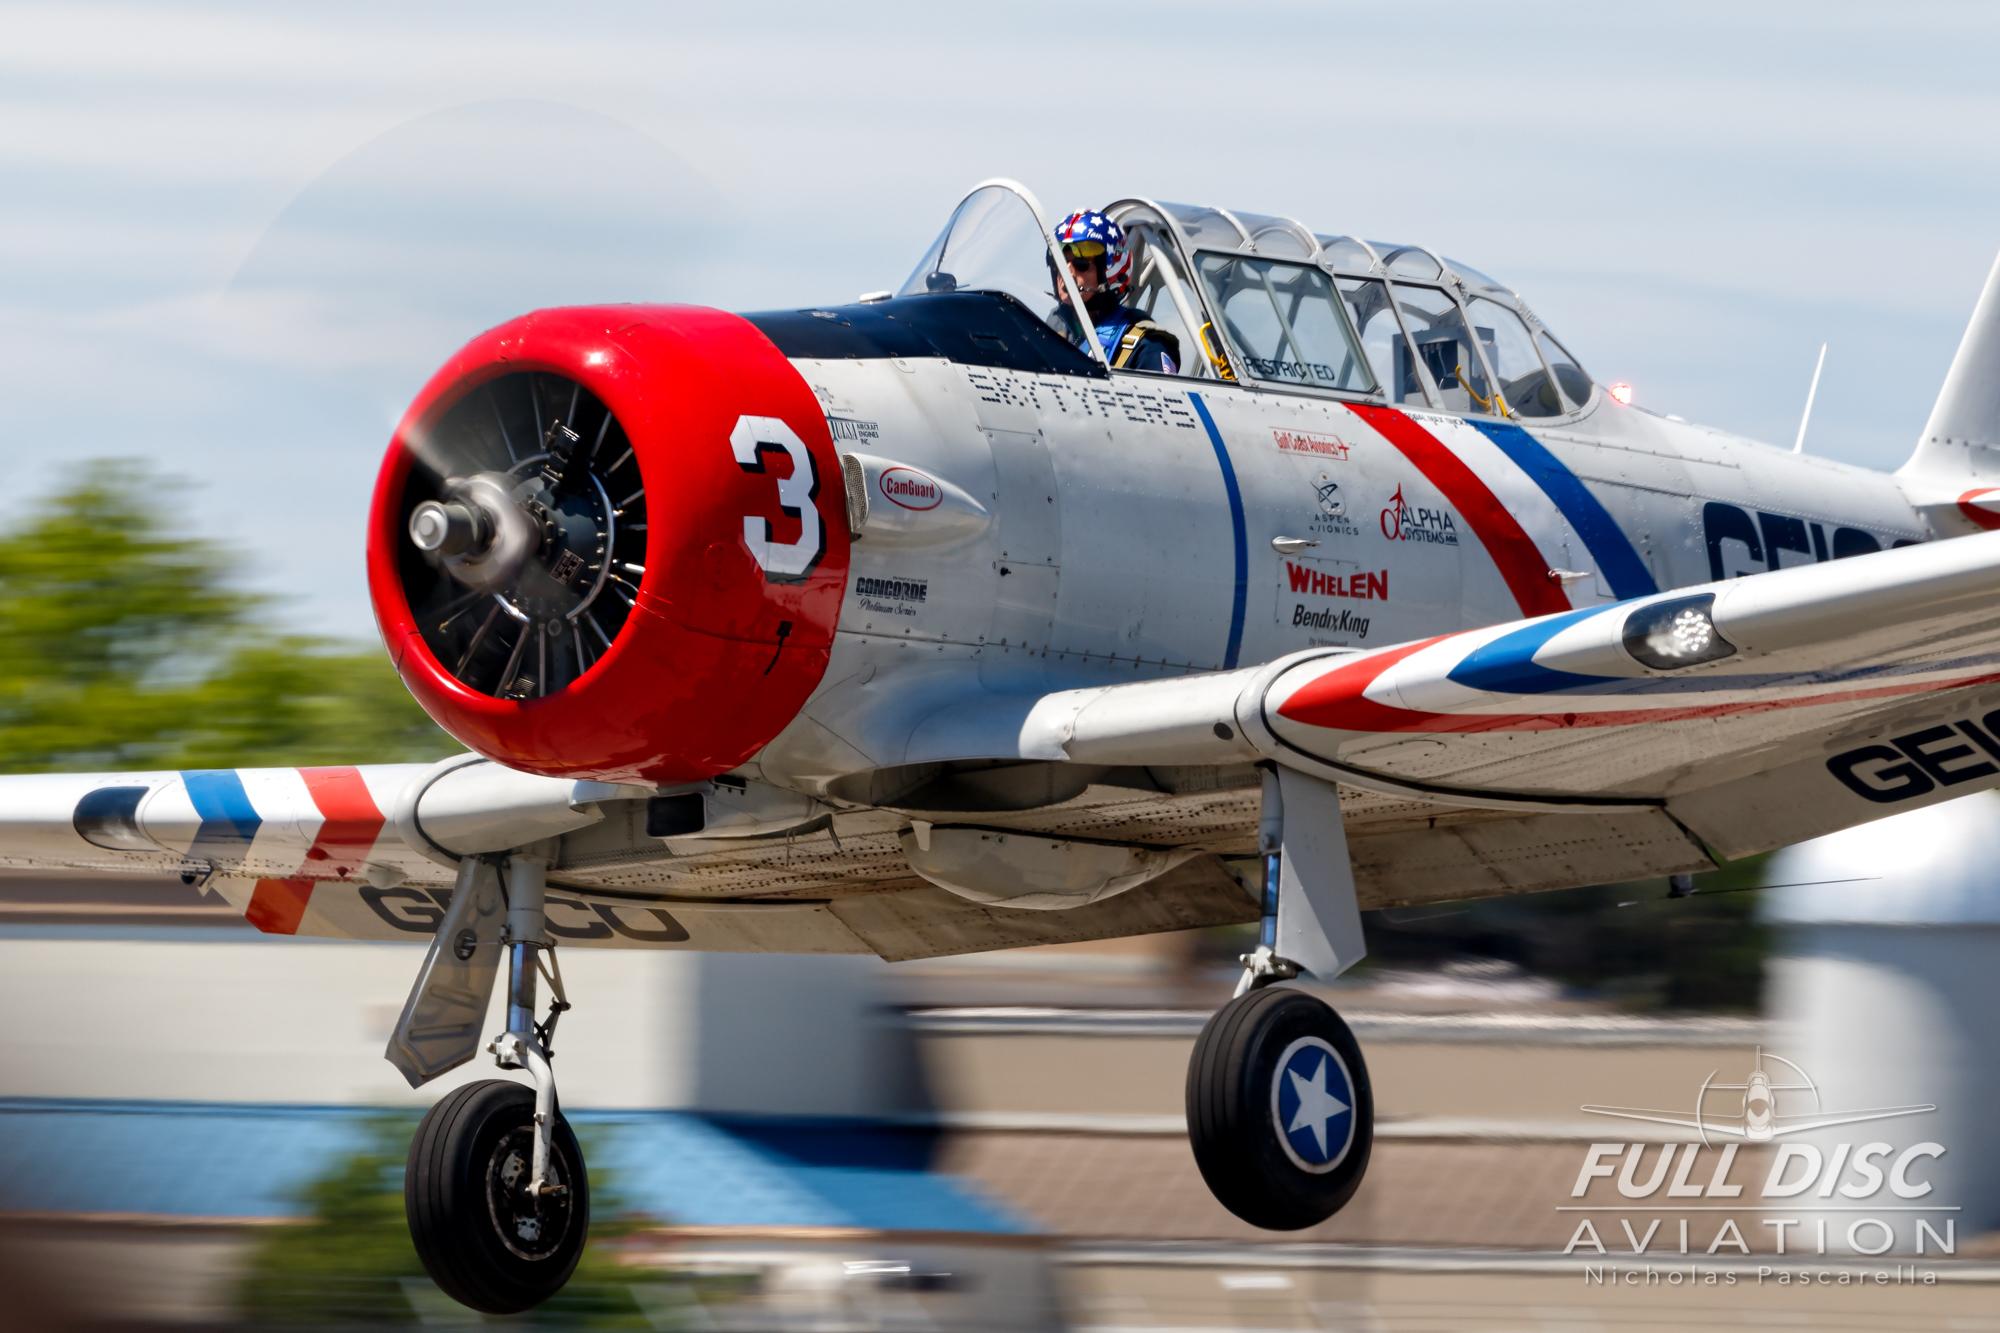 americanairpowermuseum_nicholaspascarella_nickpascarella_fulldiscaviation_legendsofairpower2019_aviation_warbird_skytypers_landing_t6texan.jpg